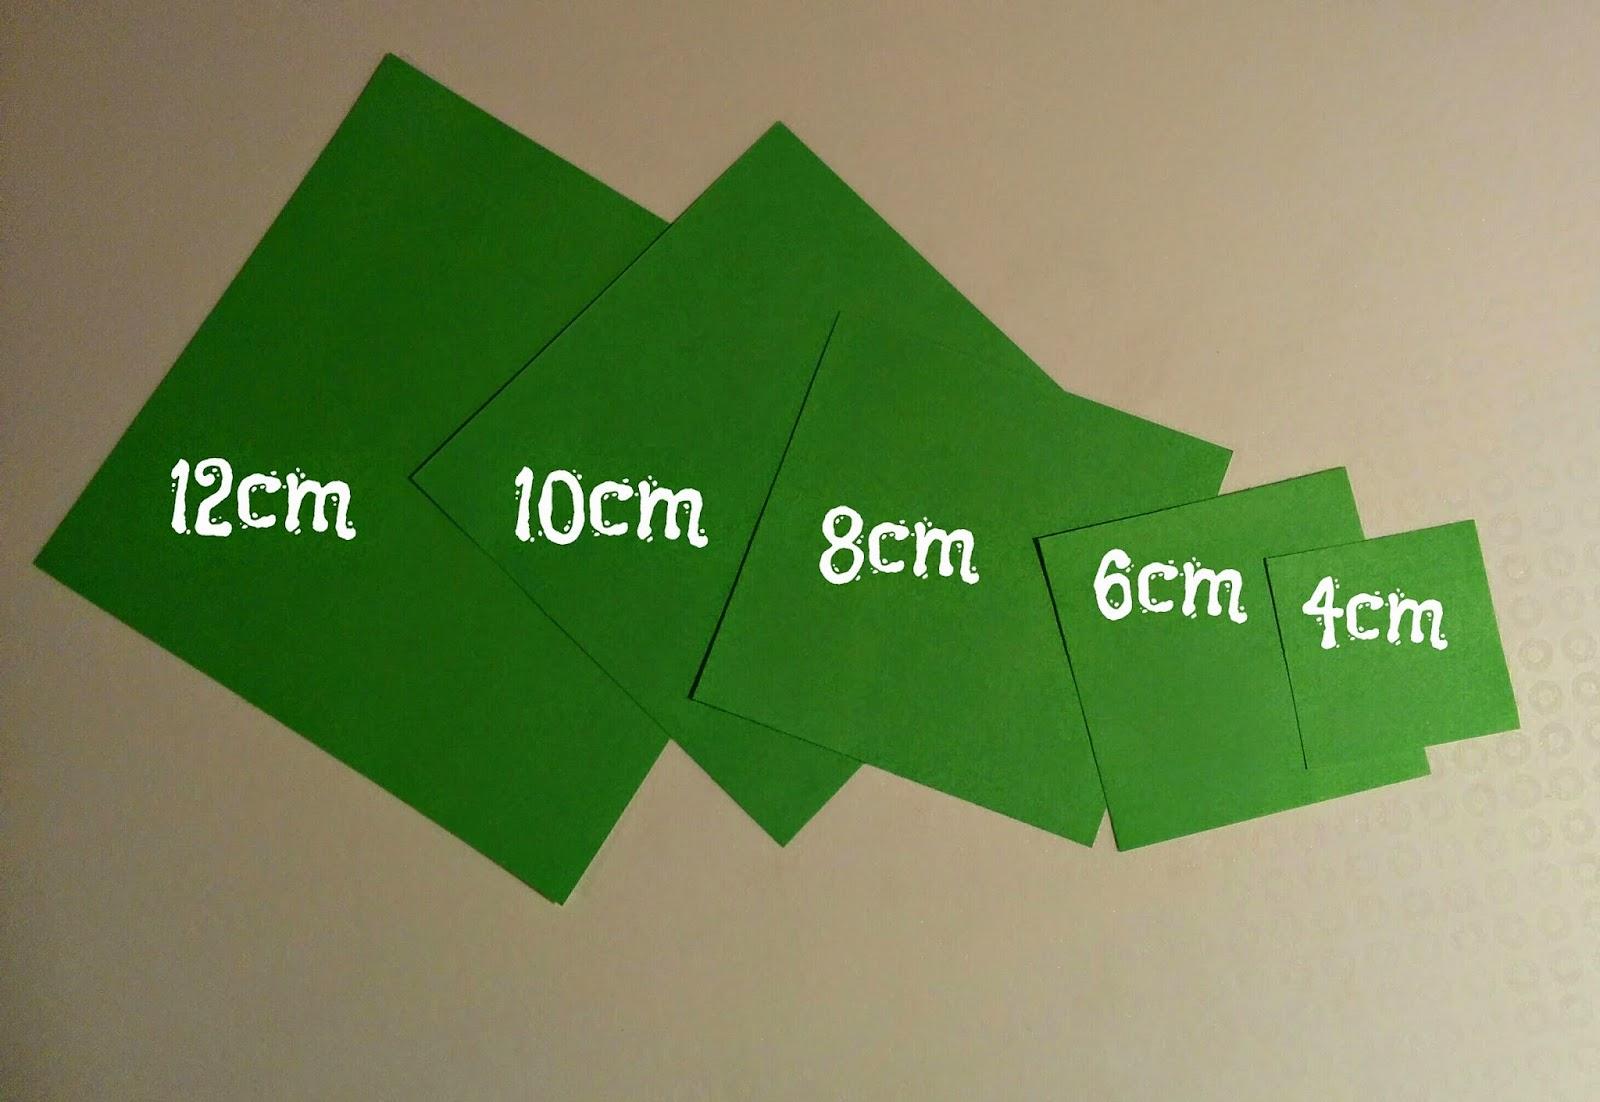 Los chiribiquis de winga rbol de navidad de origami i - Arbol de navidad origami ...